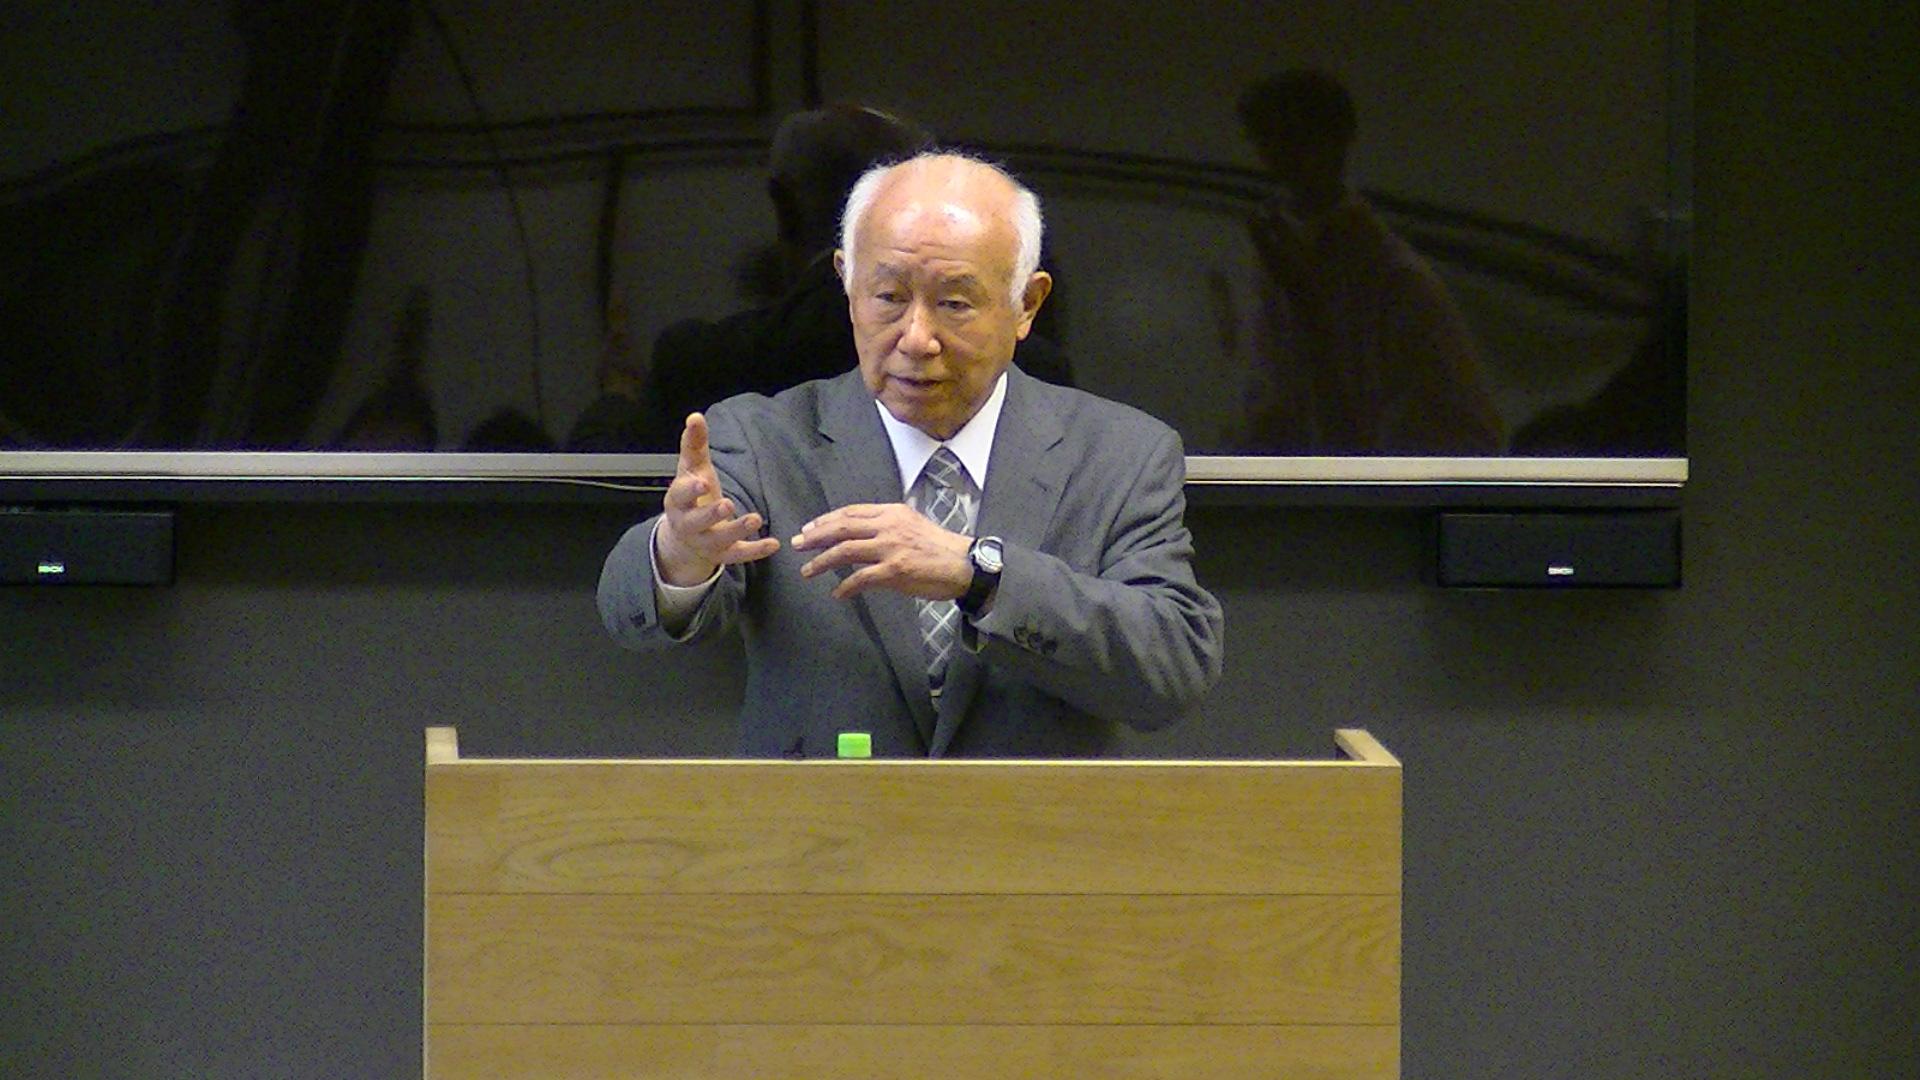 PIC 0564 - 2017年2月4日東京思風塾開催